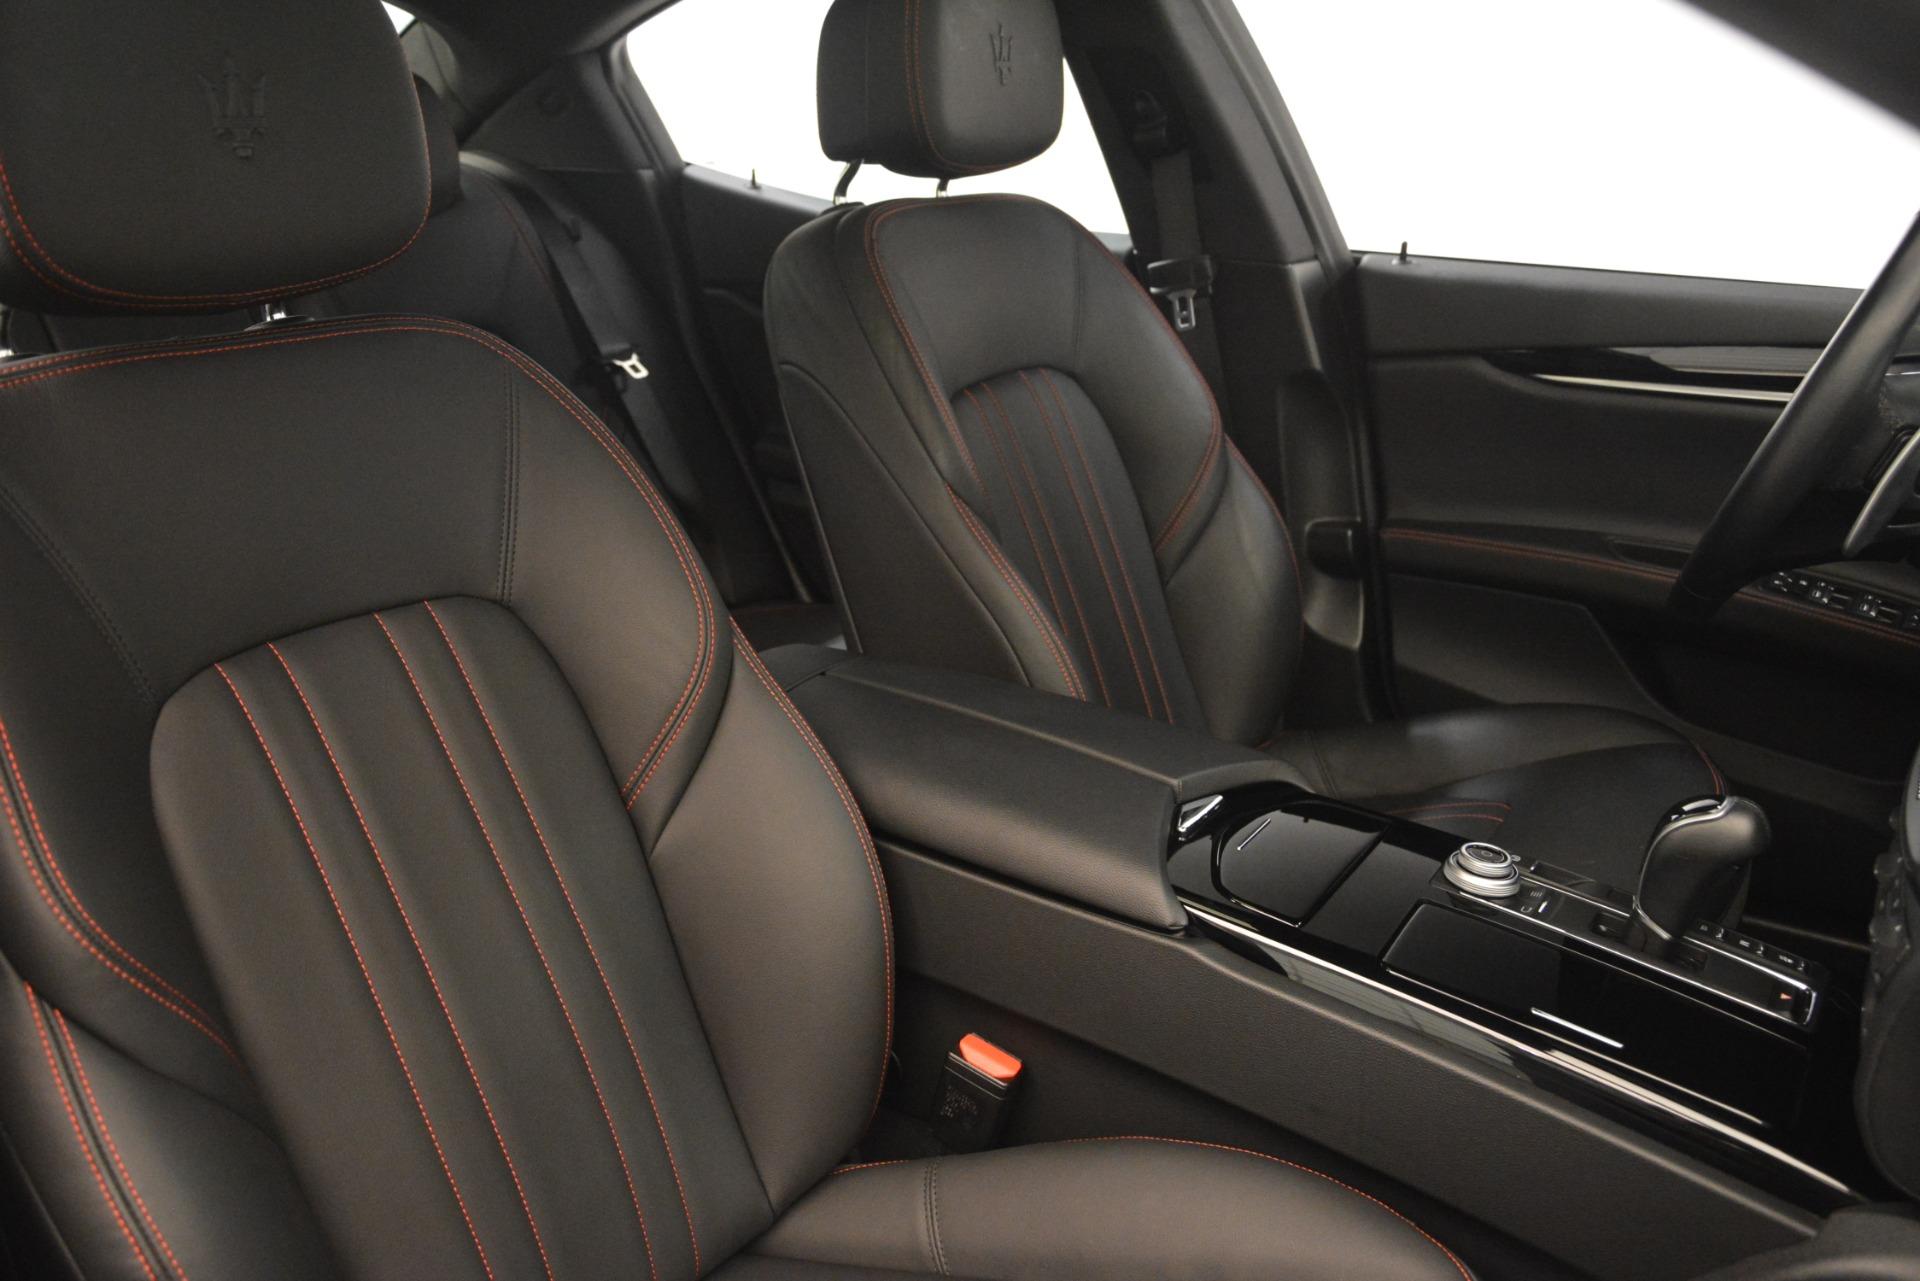 Used 2018 Maserati Ghibli S Q4 For Sale In Westport, CT 1772_p20